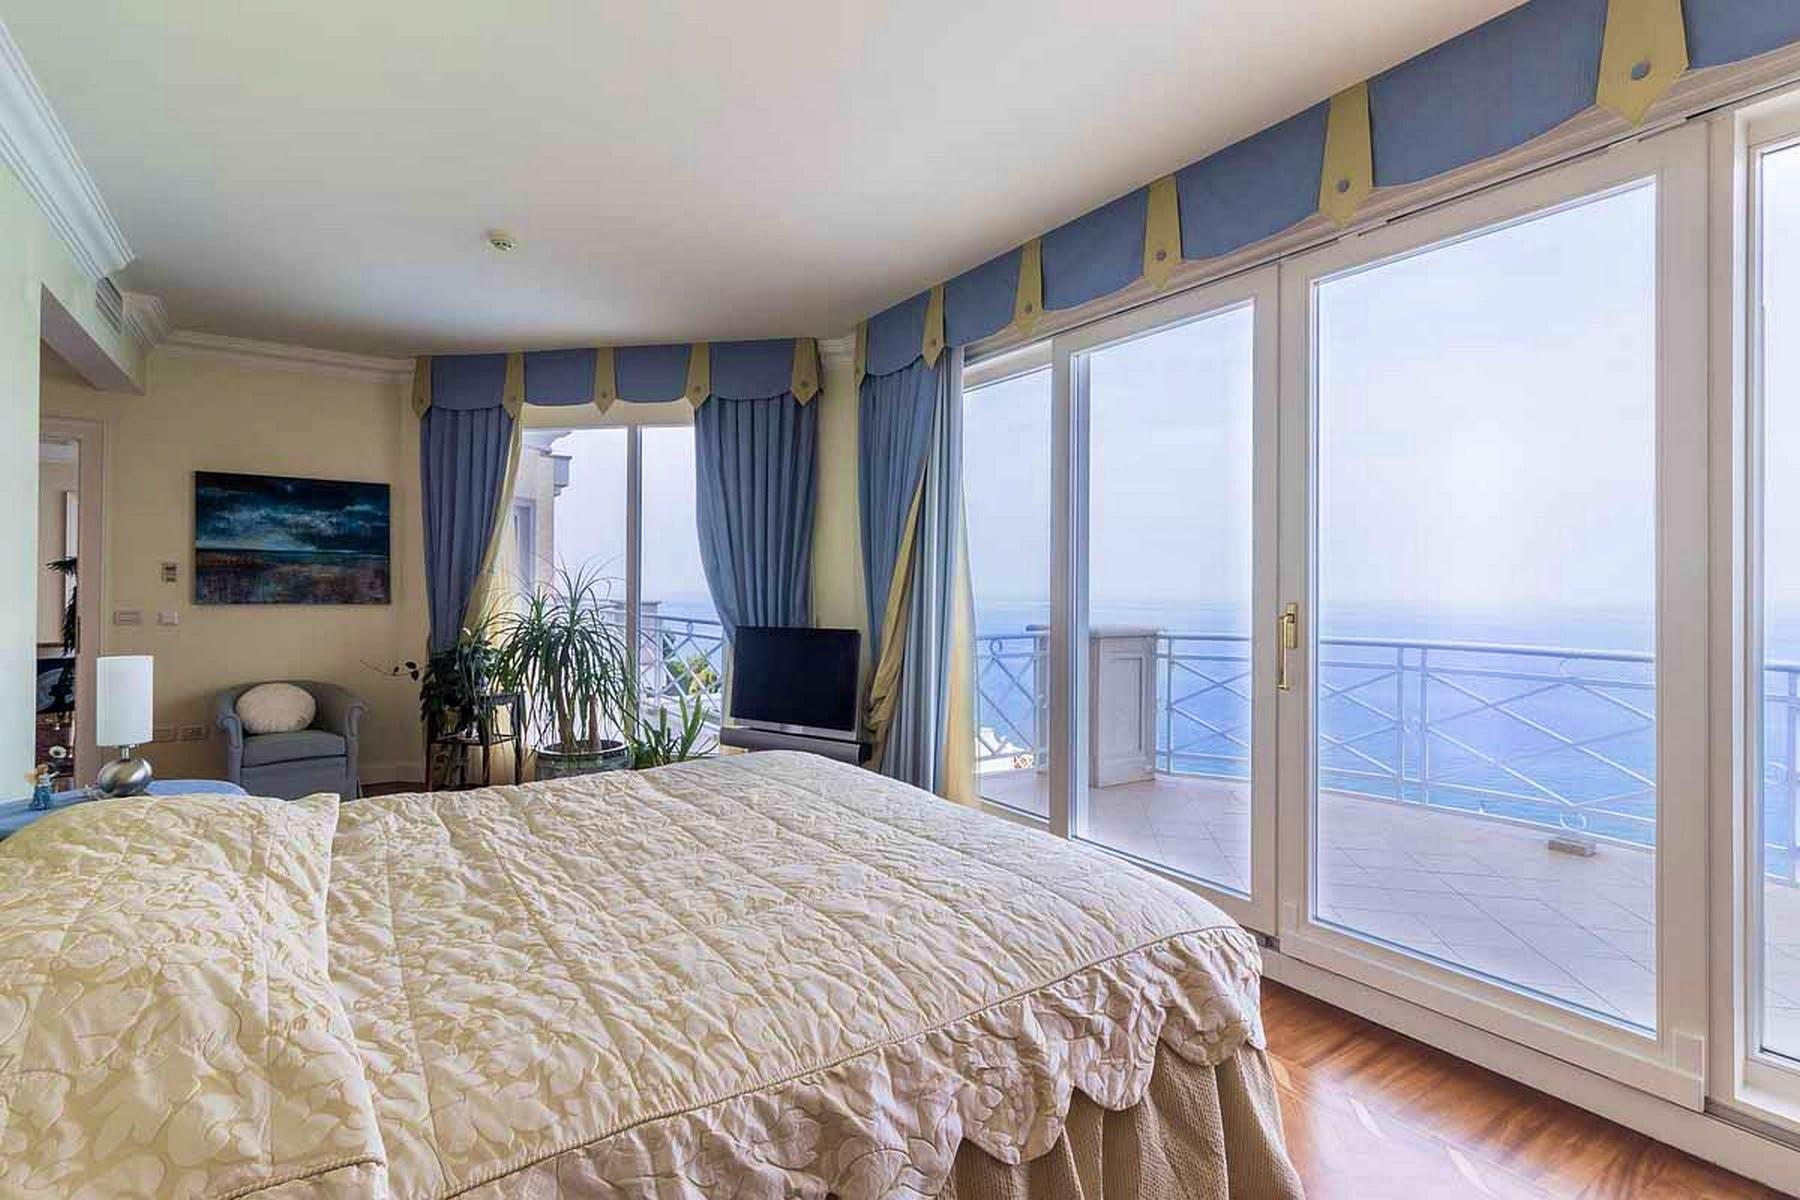 Glavna spavaća soba s pogledom na more